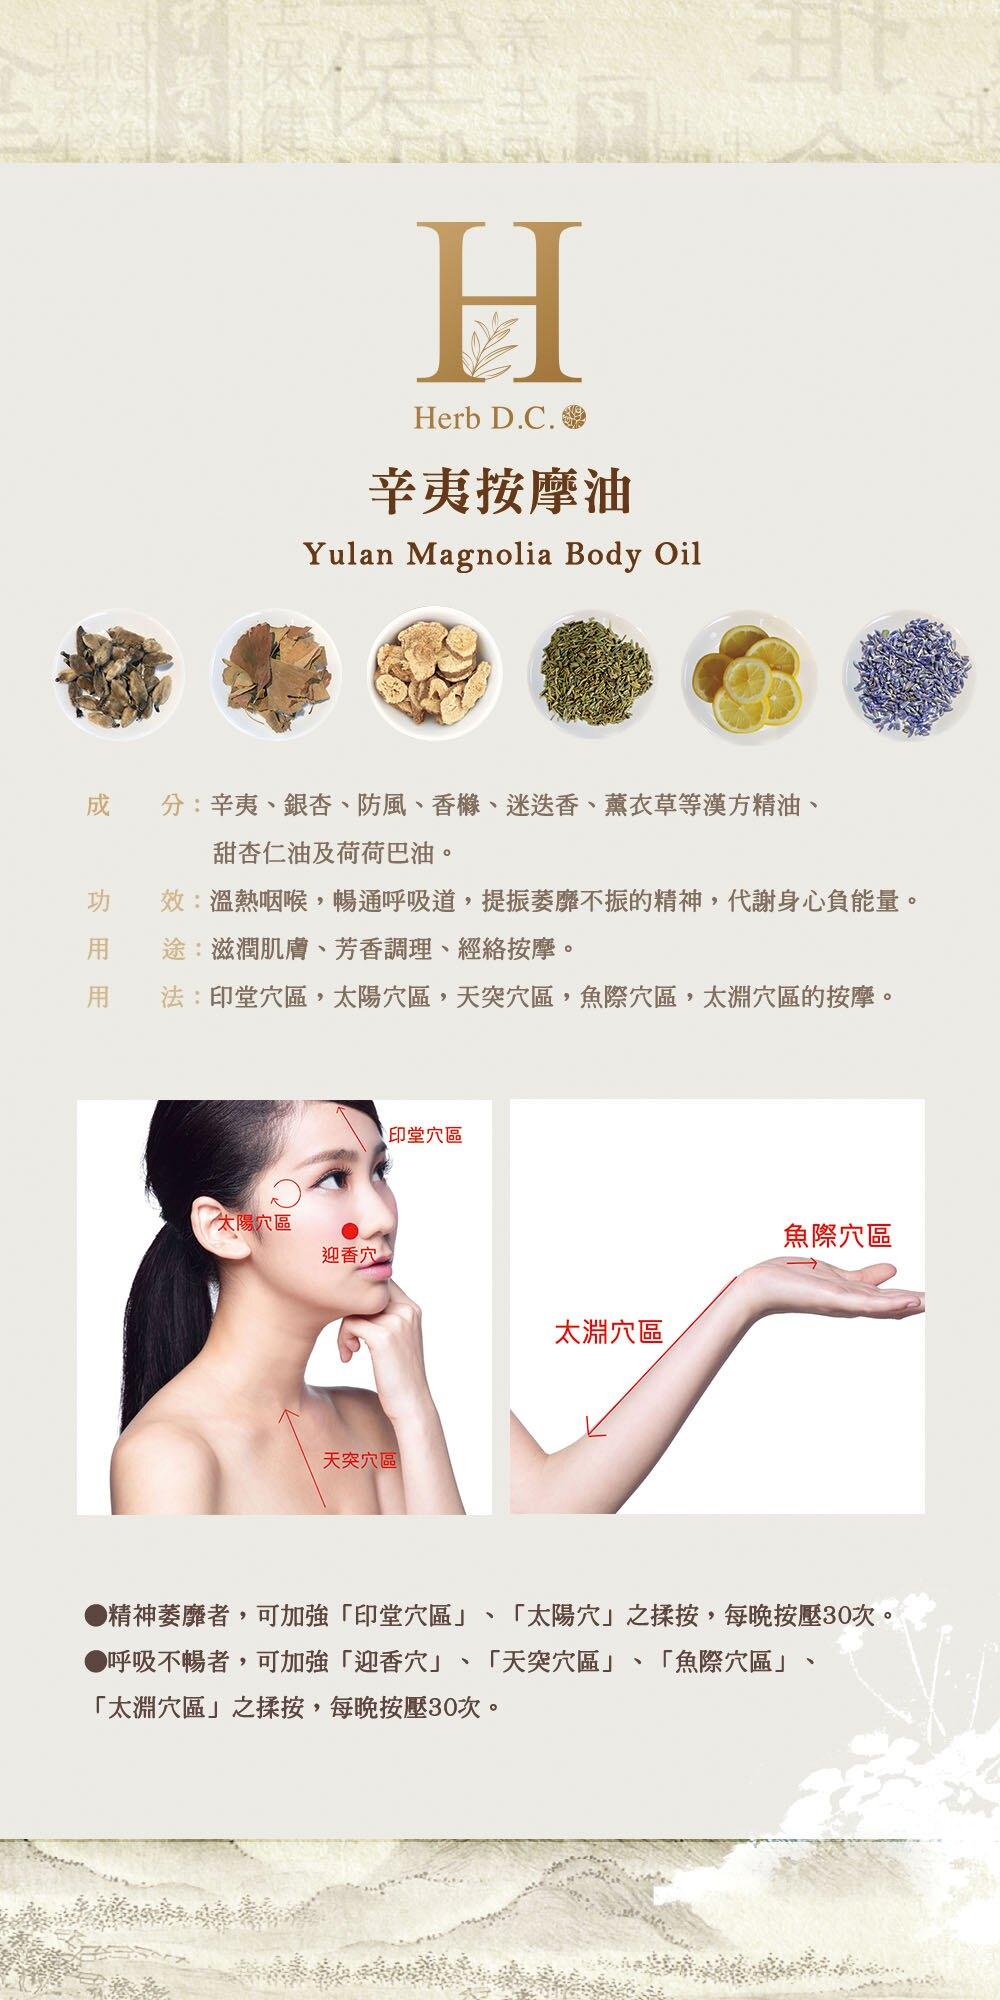 【漢方精油】辛夷按摩油 Yulan magnolia Body Oil 30ml【CAREIN香草精油學苑】